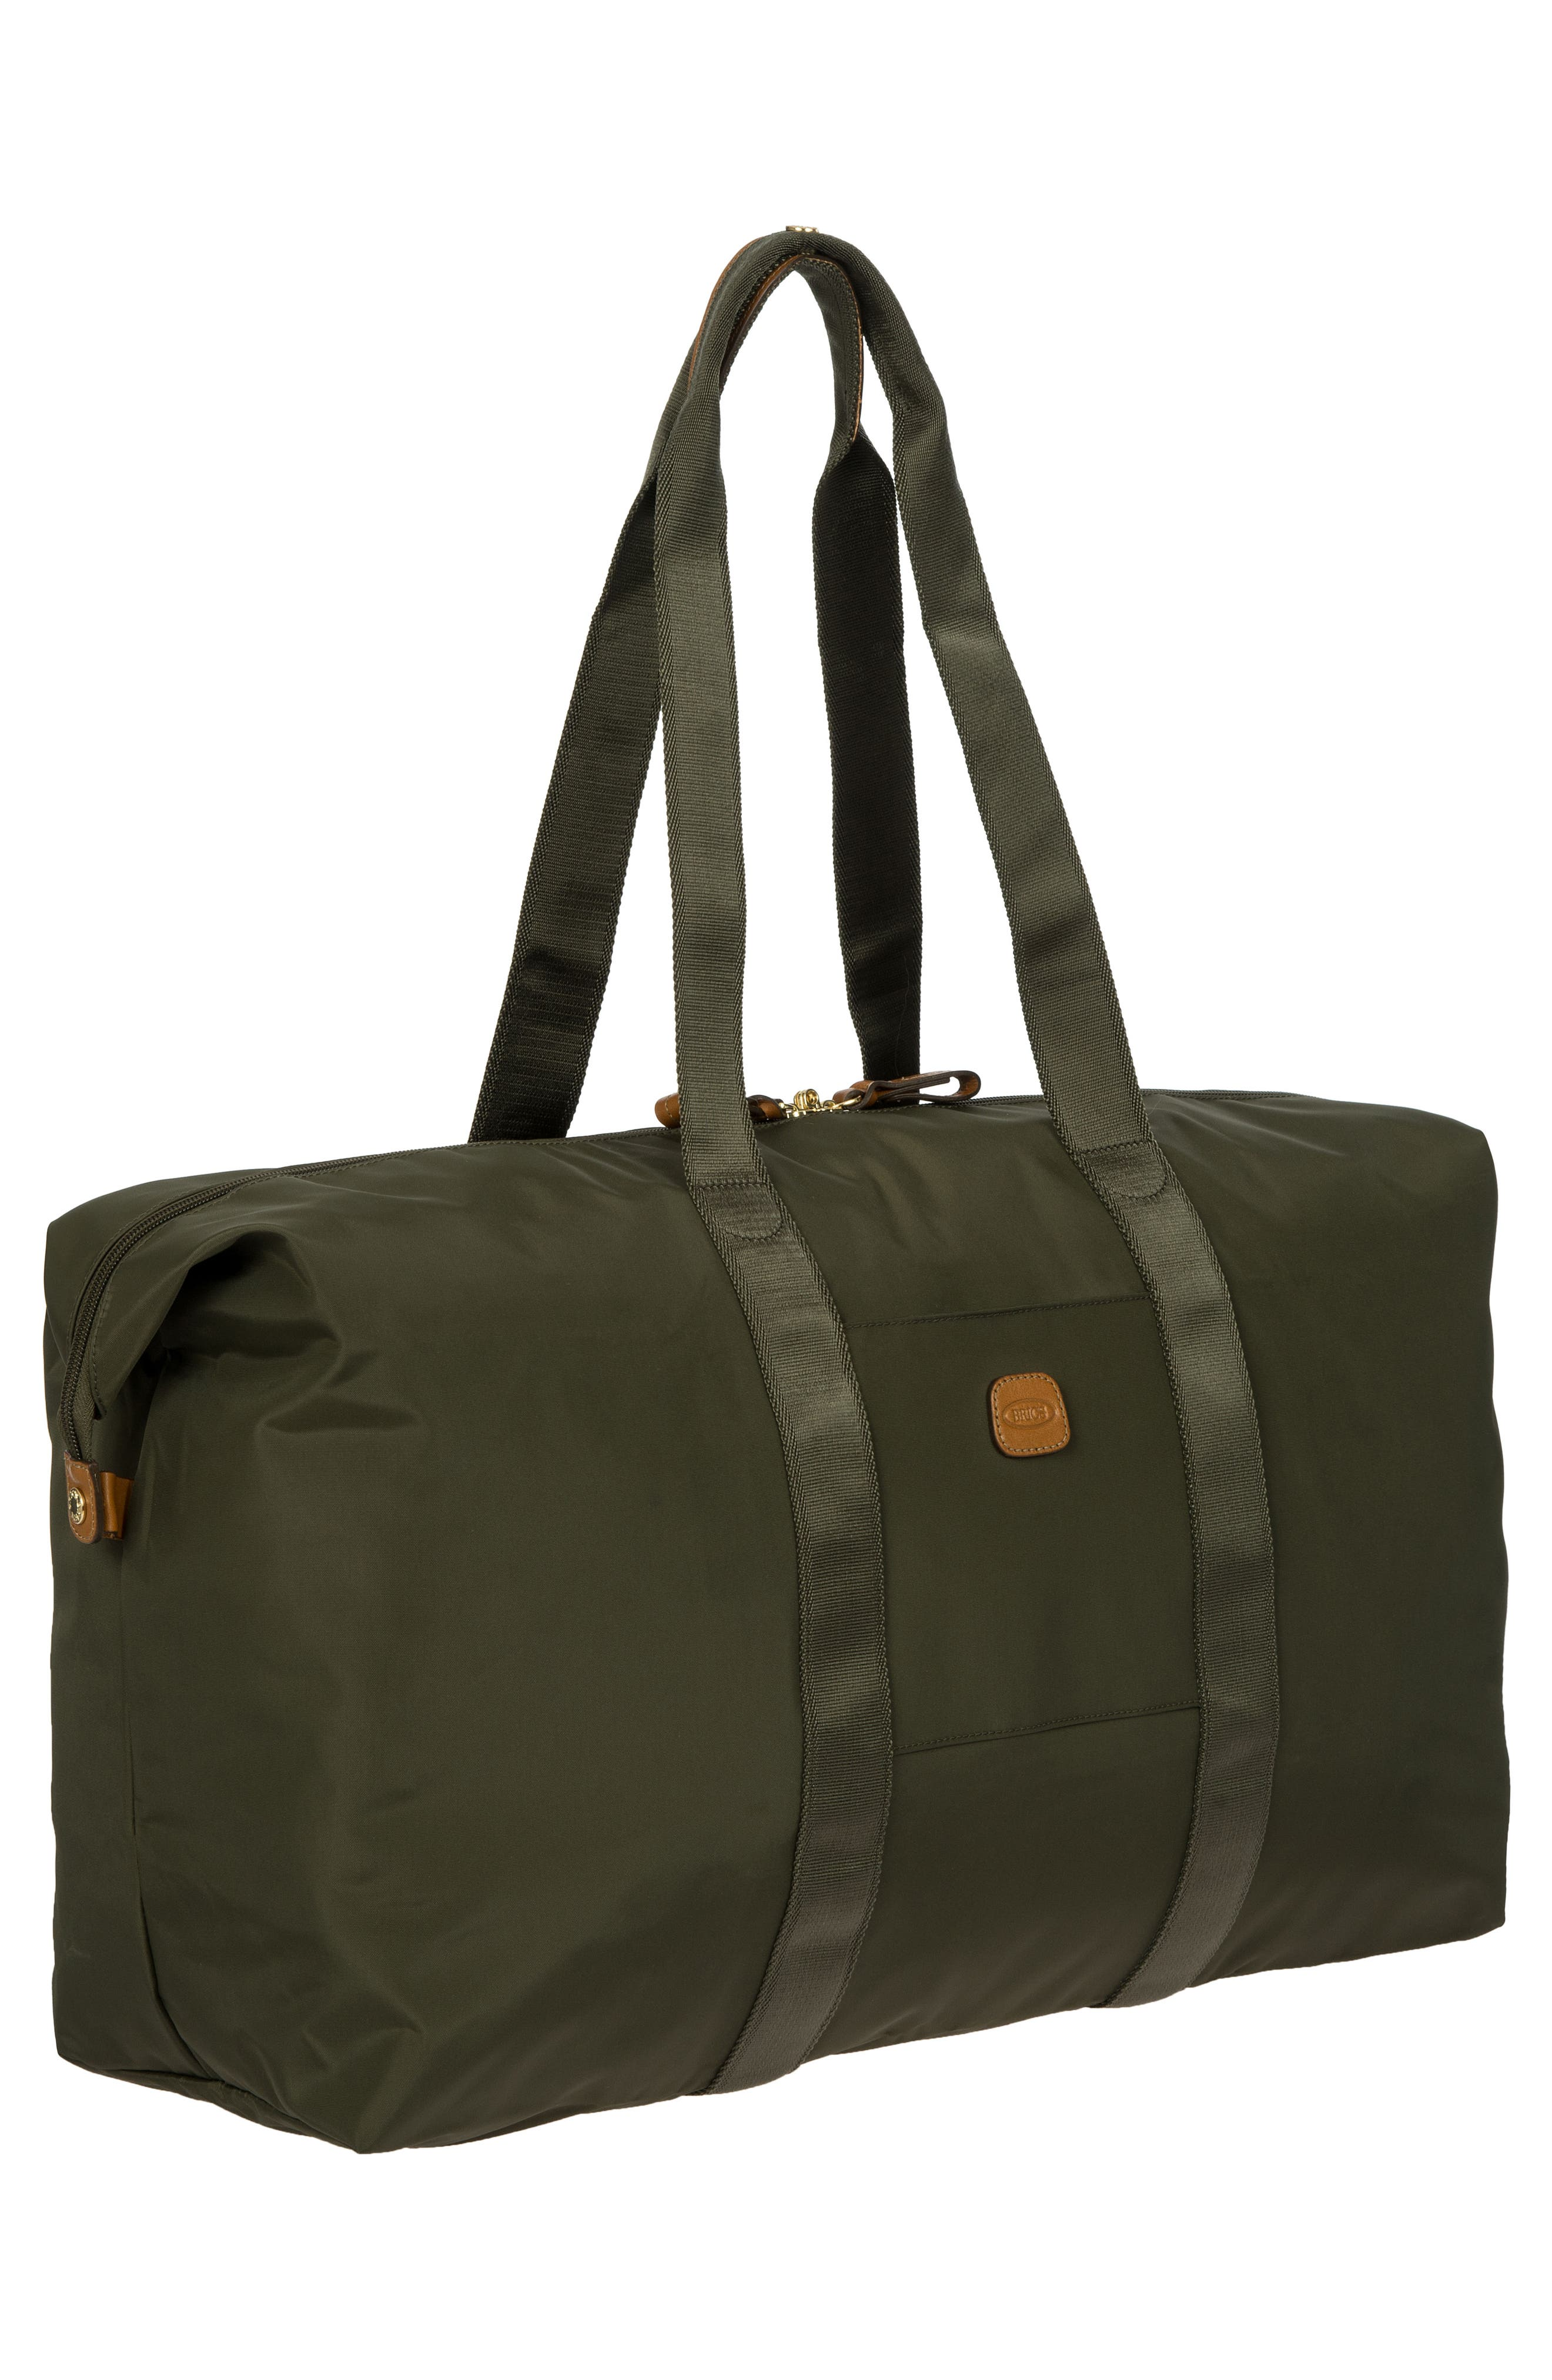 X-Bag 22-Inch Folding Duffel Bag,                             Alternate thumbnail 4, color,                             OLIVE